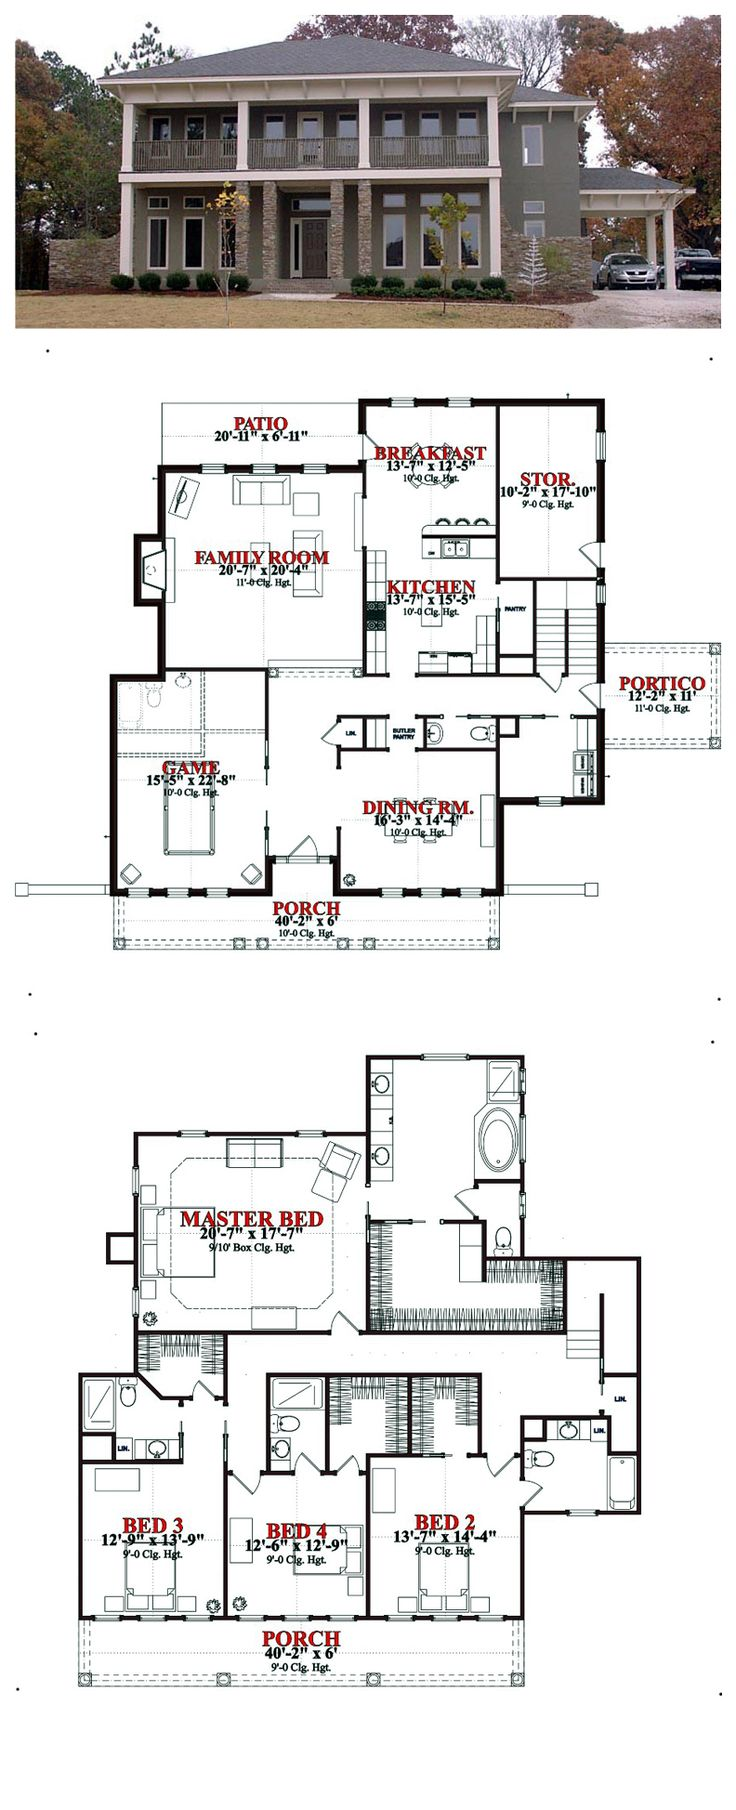 Plantation House Plan 78830 | Total Living Area: 4007 sq ft, 4 bedrooms & 4.5 bathrooms. #plantationhouse #houseplan